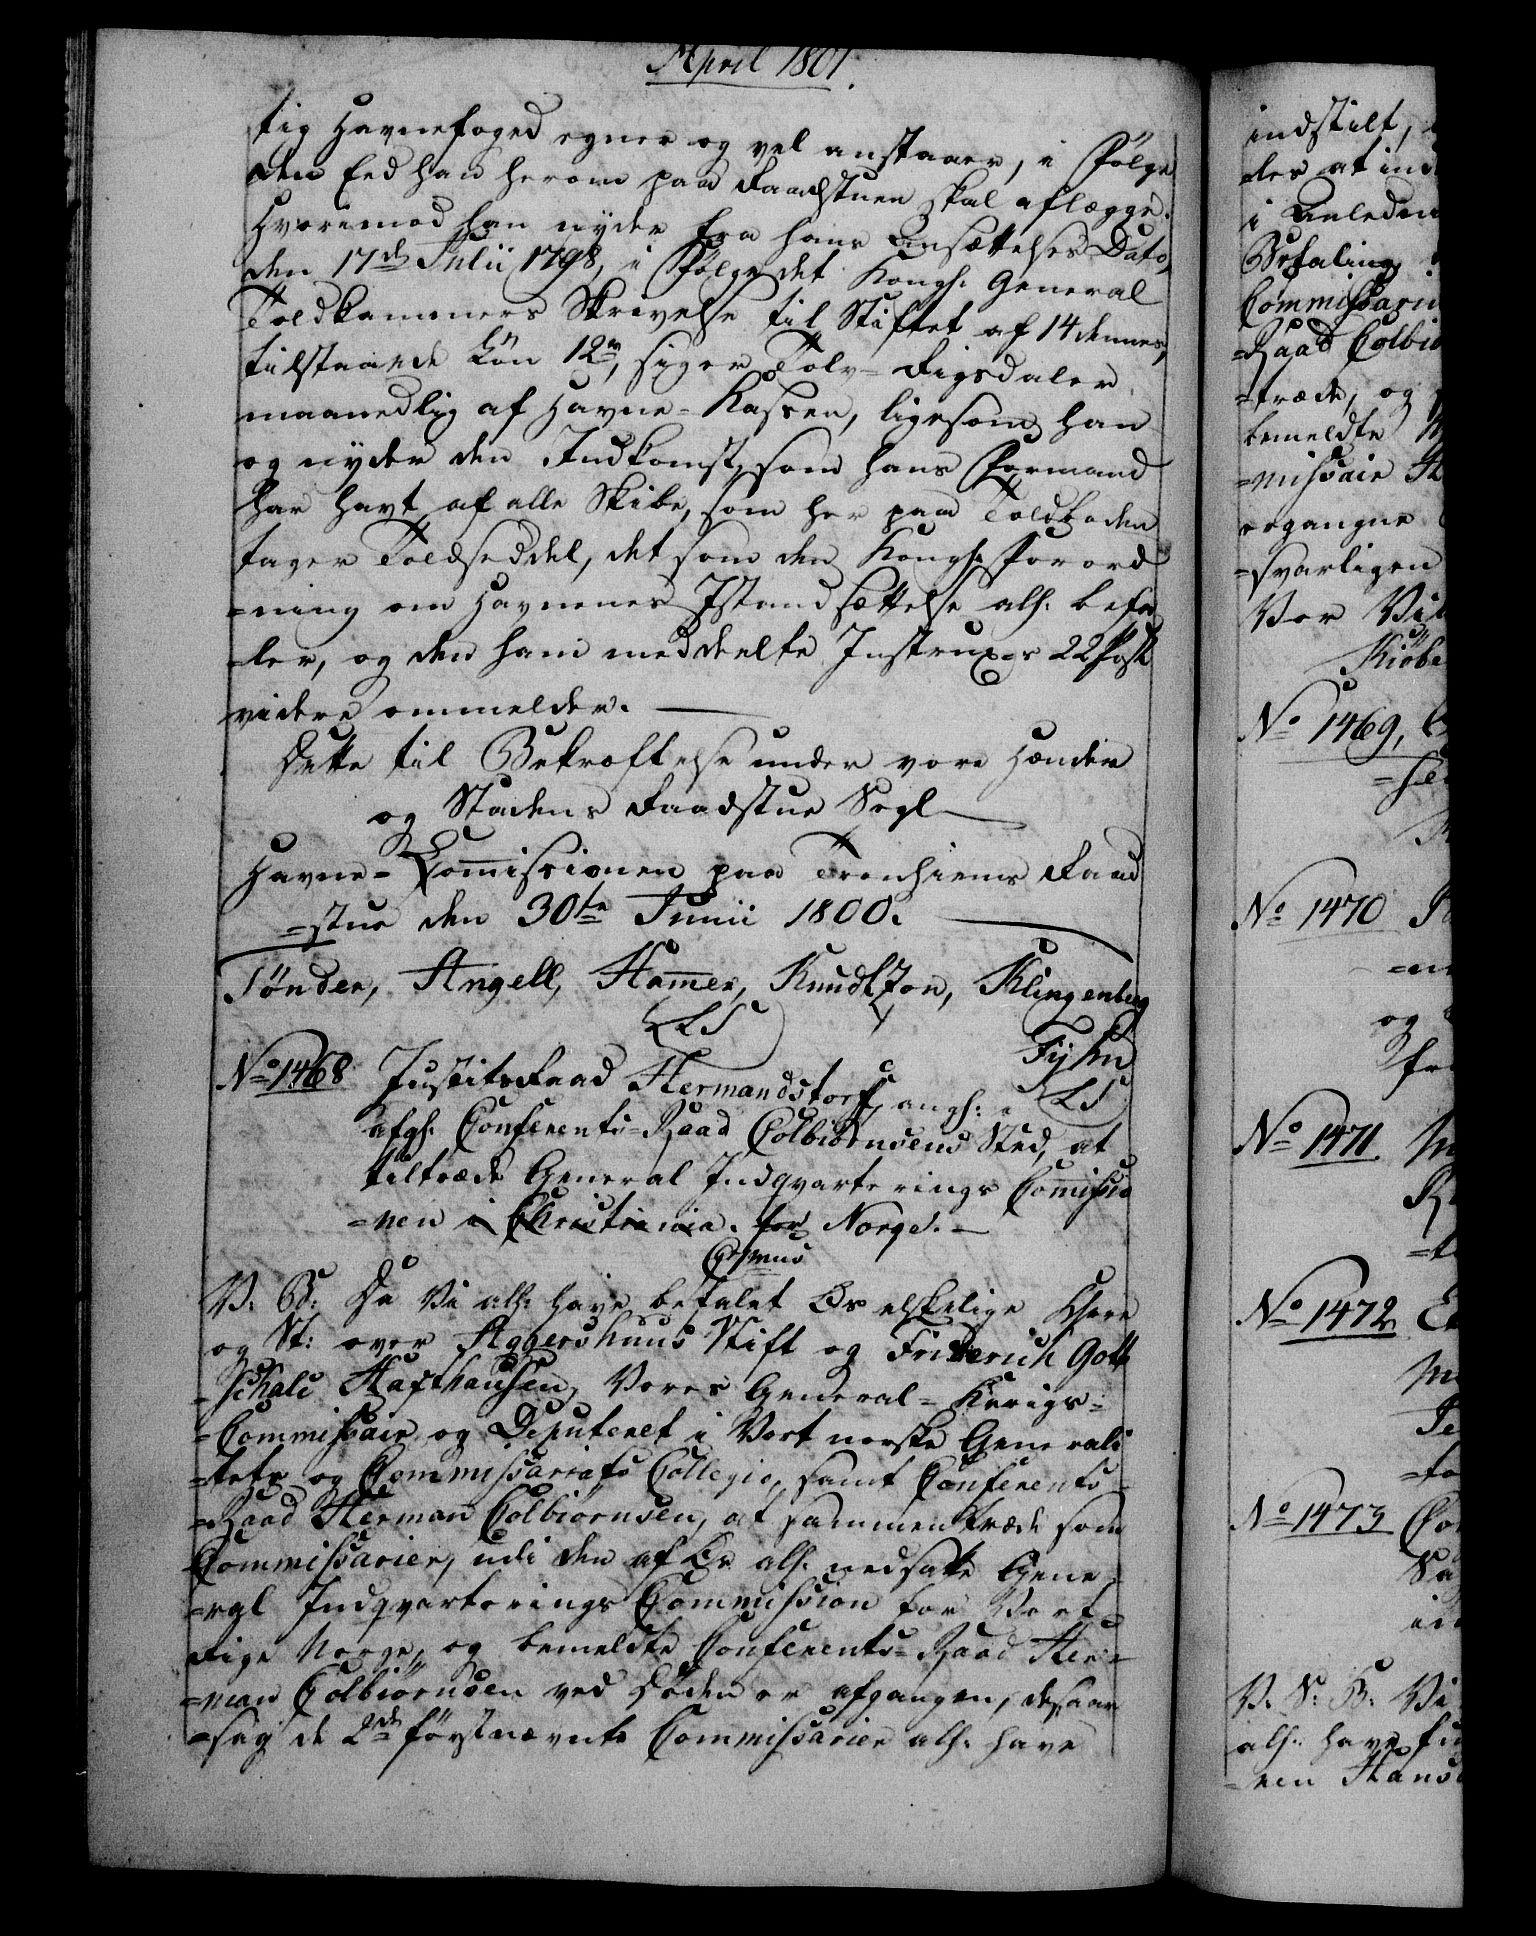 RA, Danske Kanselli 1800-1814, H/Hf/Hfb/Hfba/L0001: Registranter, 1800-1801, s. 382b